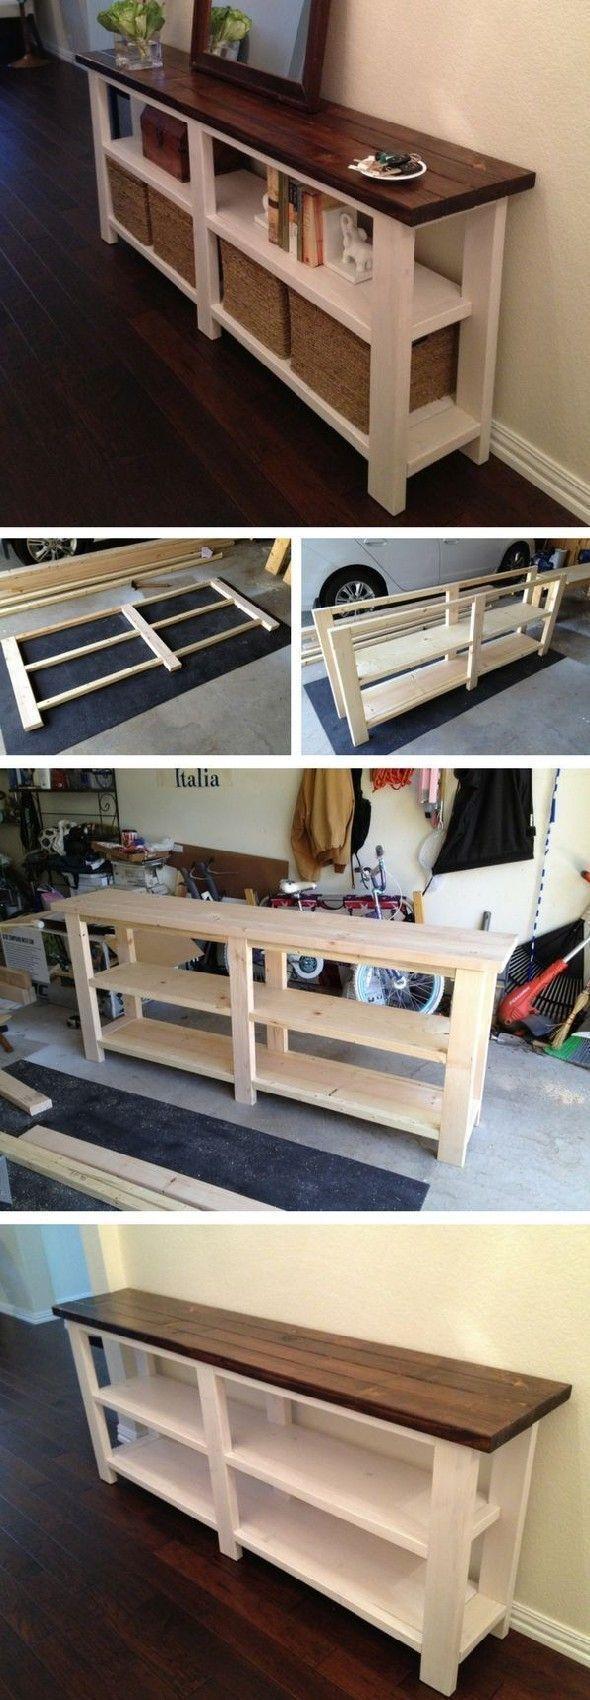 Outstanding 60+ Best Amazing DIY Furniture Ideas to Steal https://bosidolot.com/2018/02/19/60-best-amazing-diy-furniture-ideas-to-steal/ #diyfurniture